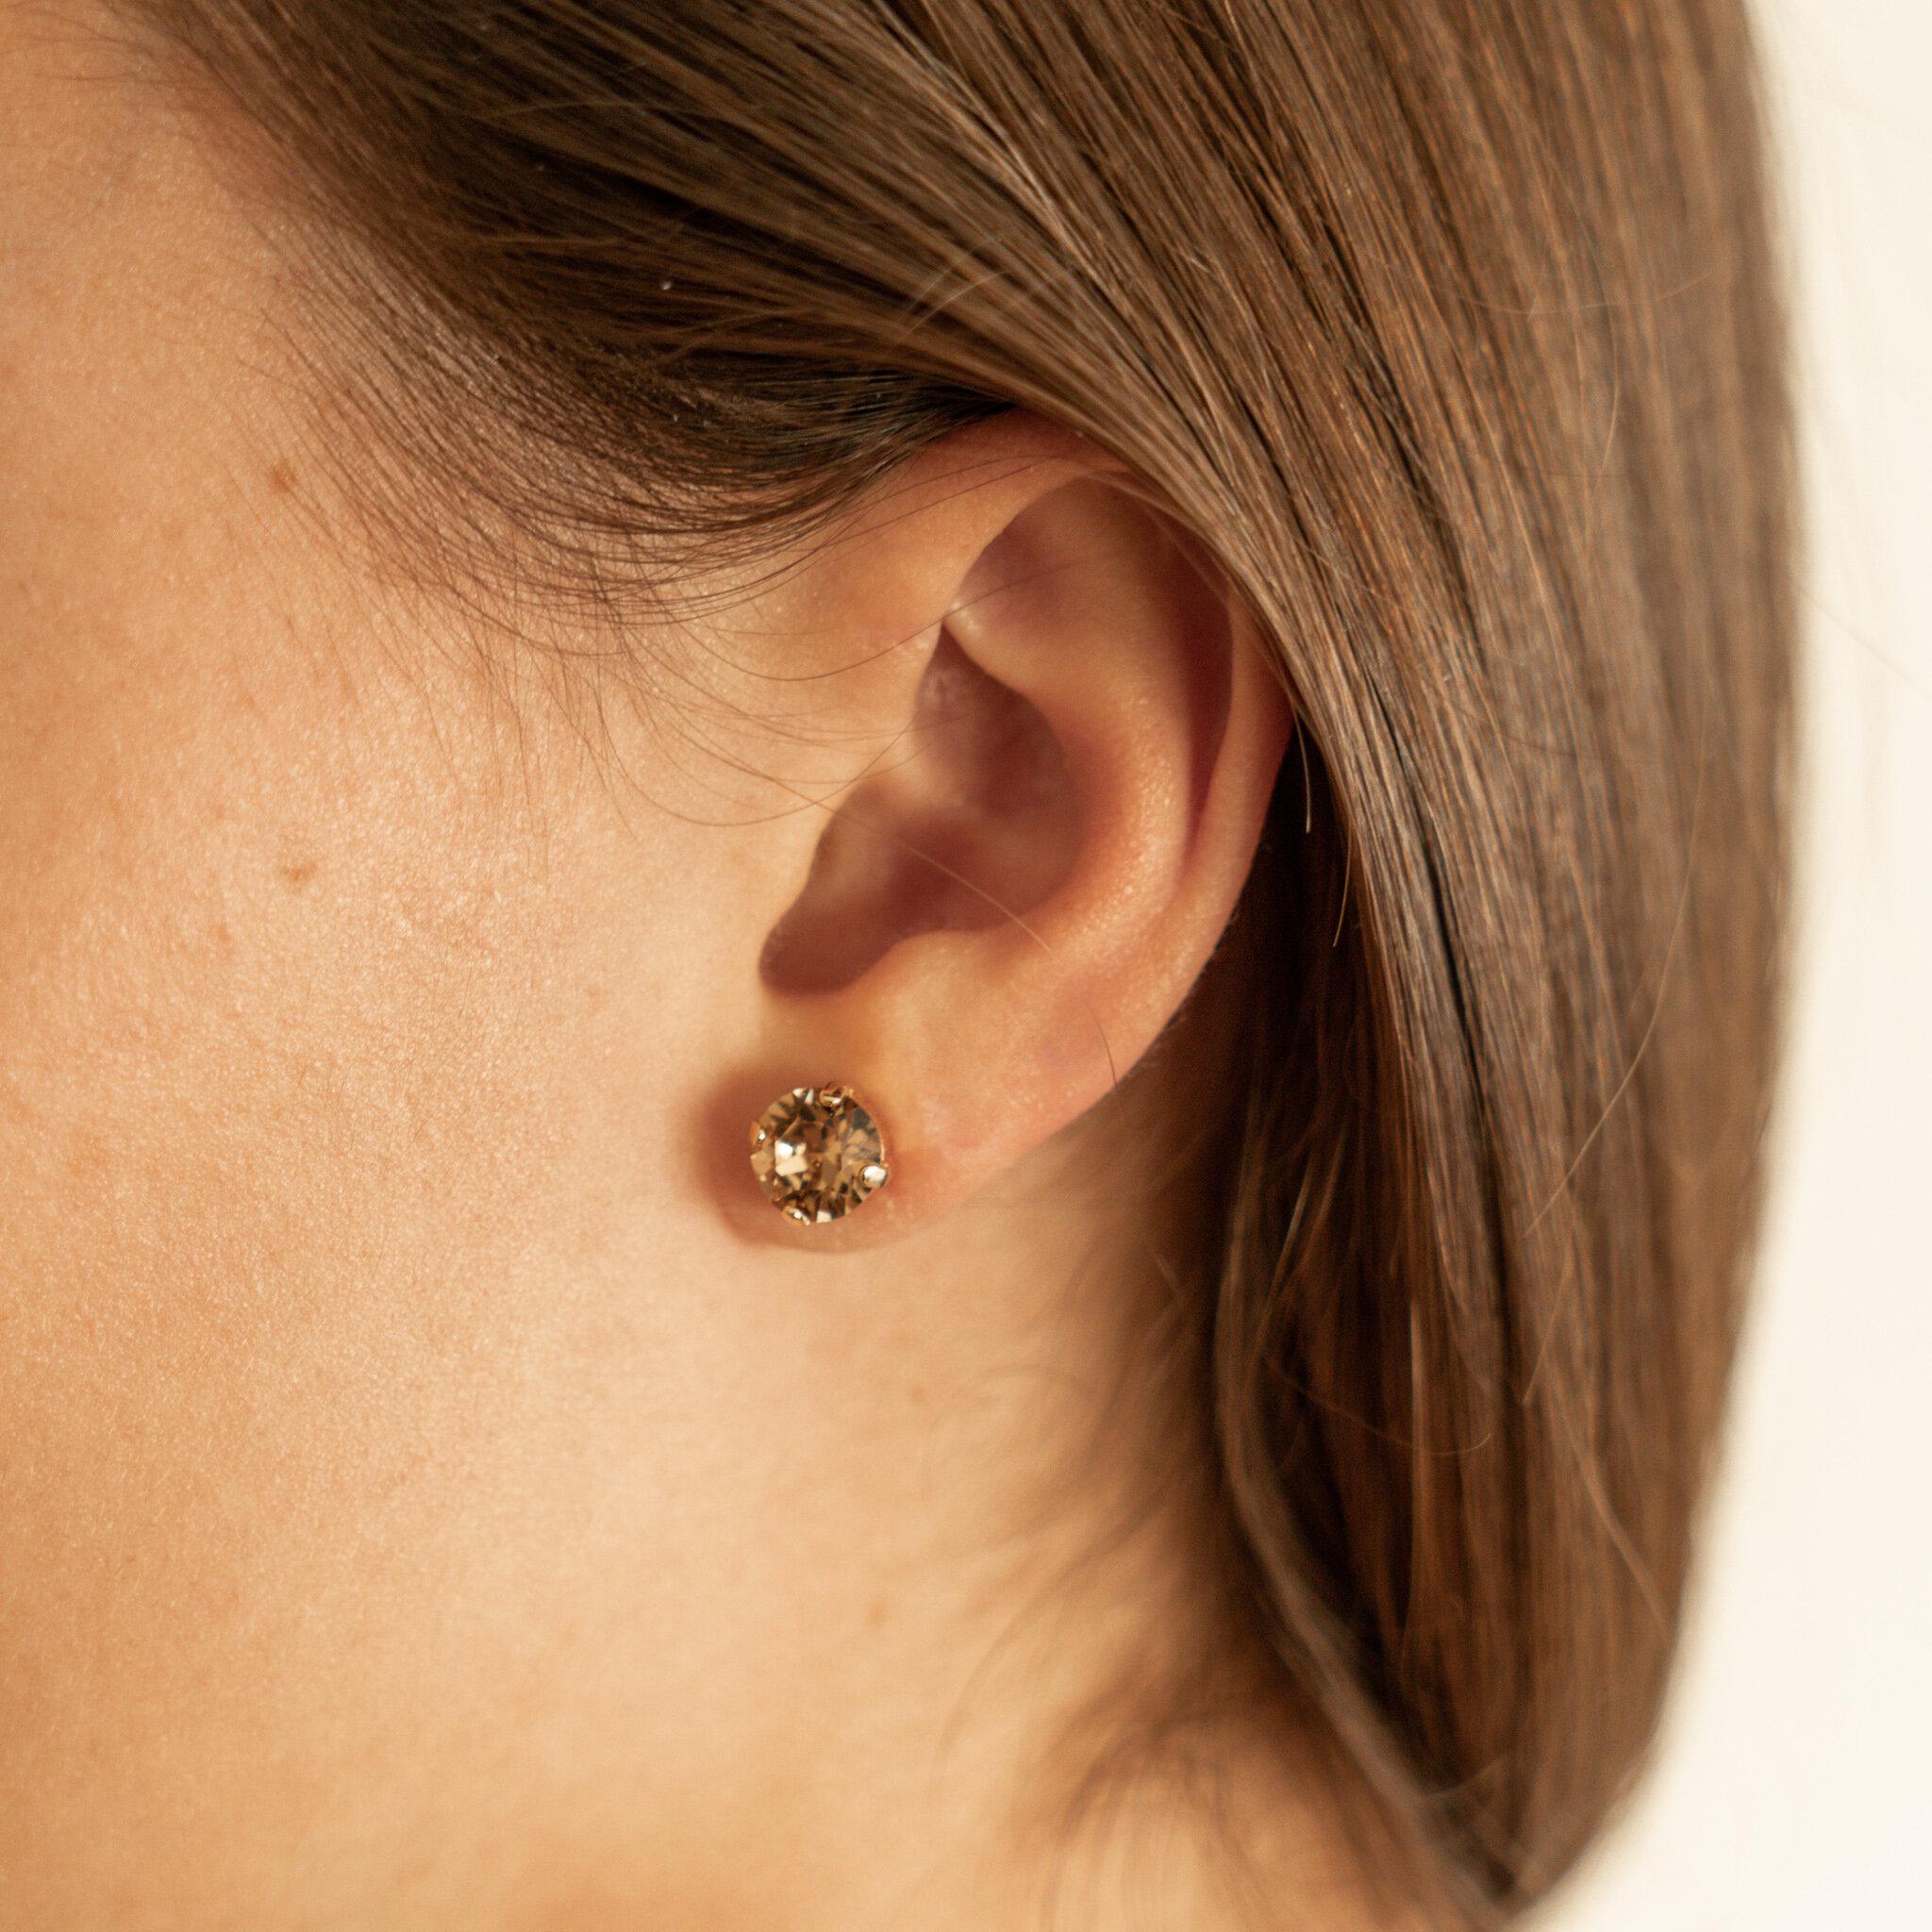 CG6879.. LARGE ACRYLIC RESIN STUD EARRINGS FREE UK P/&P